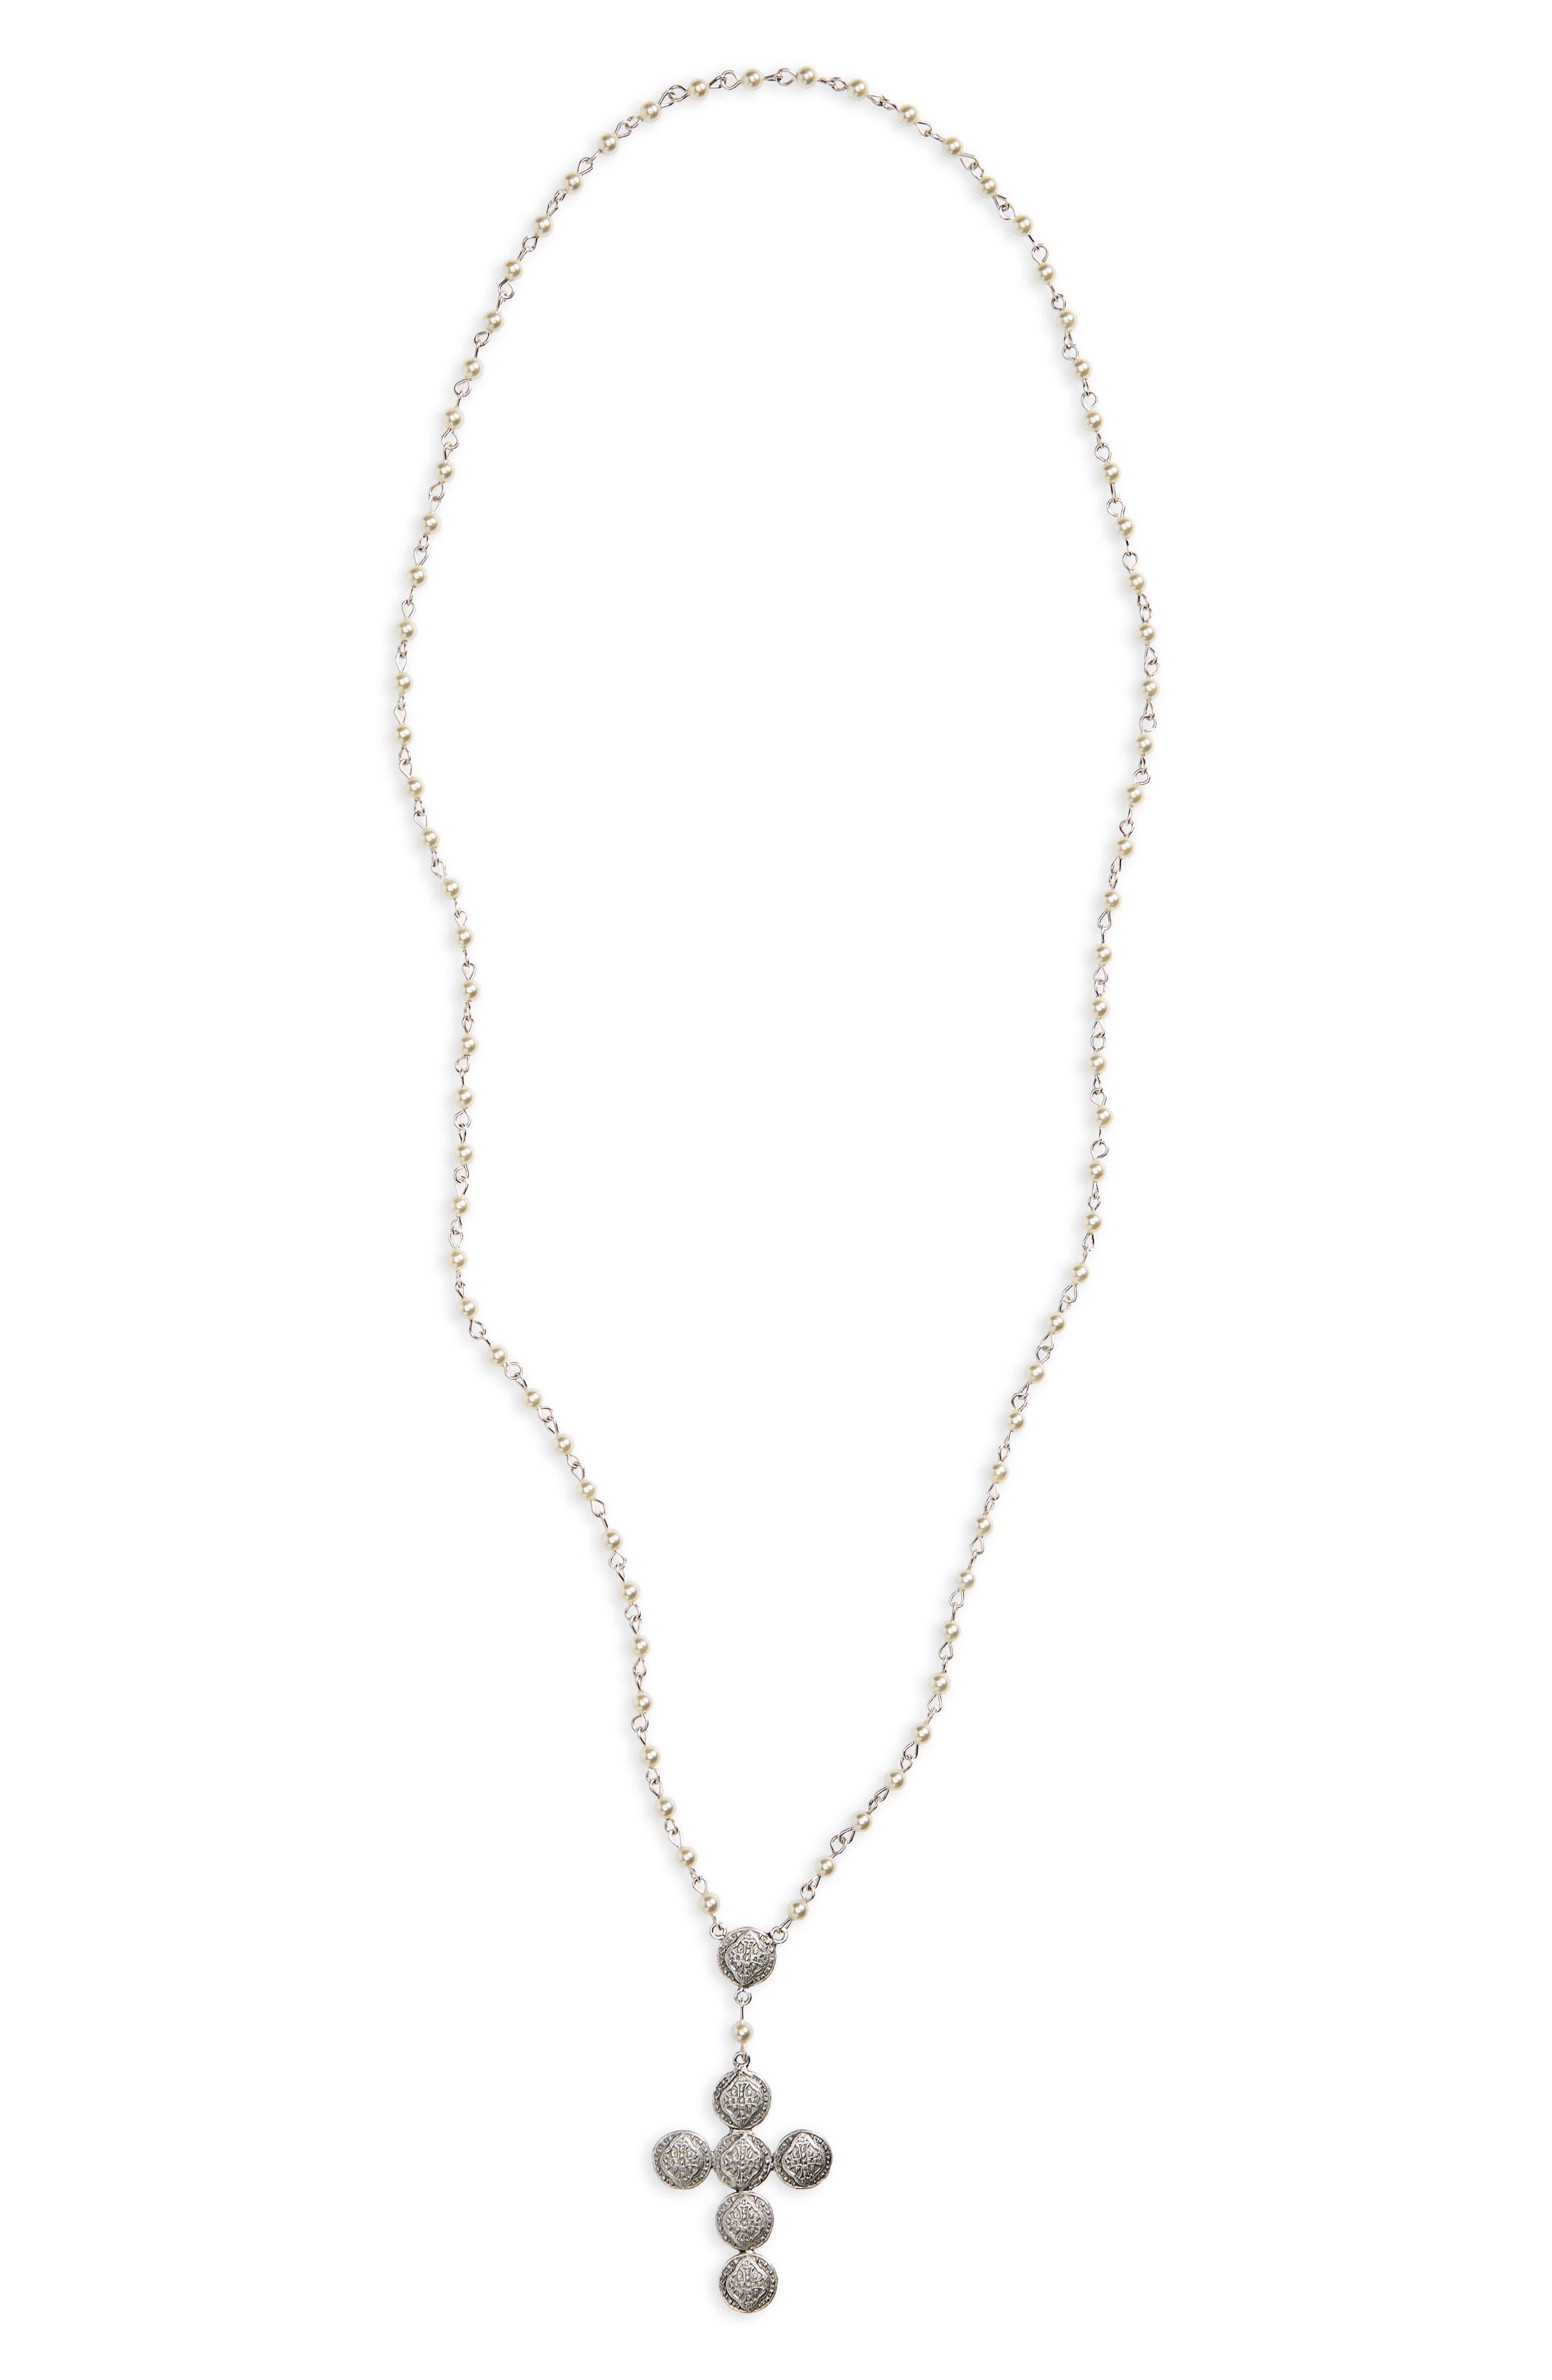 Virgins Saints & Angles Sevilla Contessa Rosary Necklace,                         Main,                         color, Cream/ Pearl